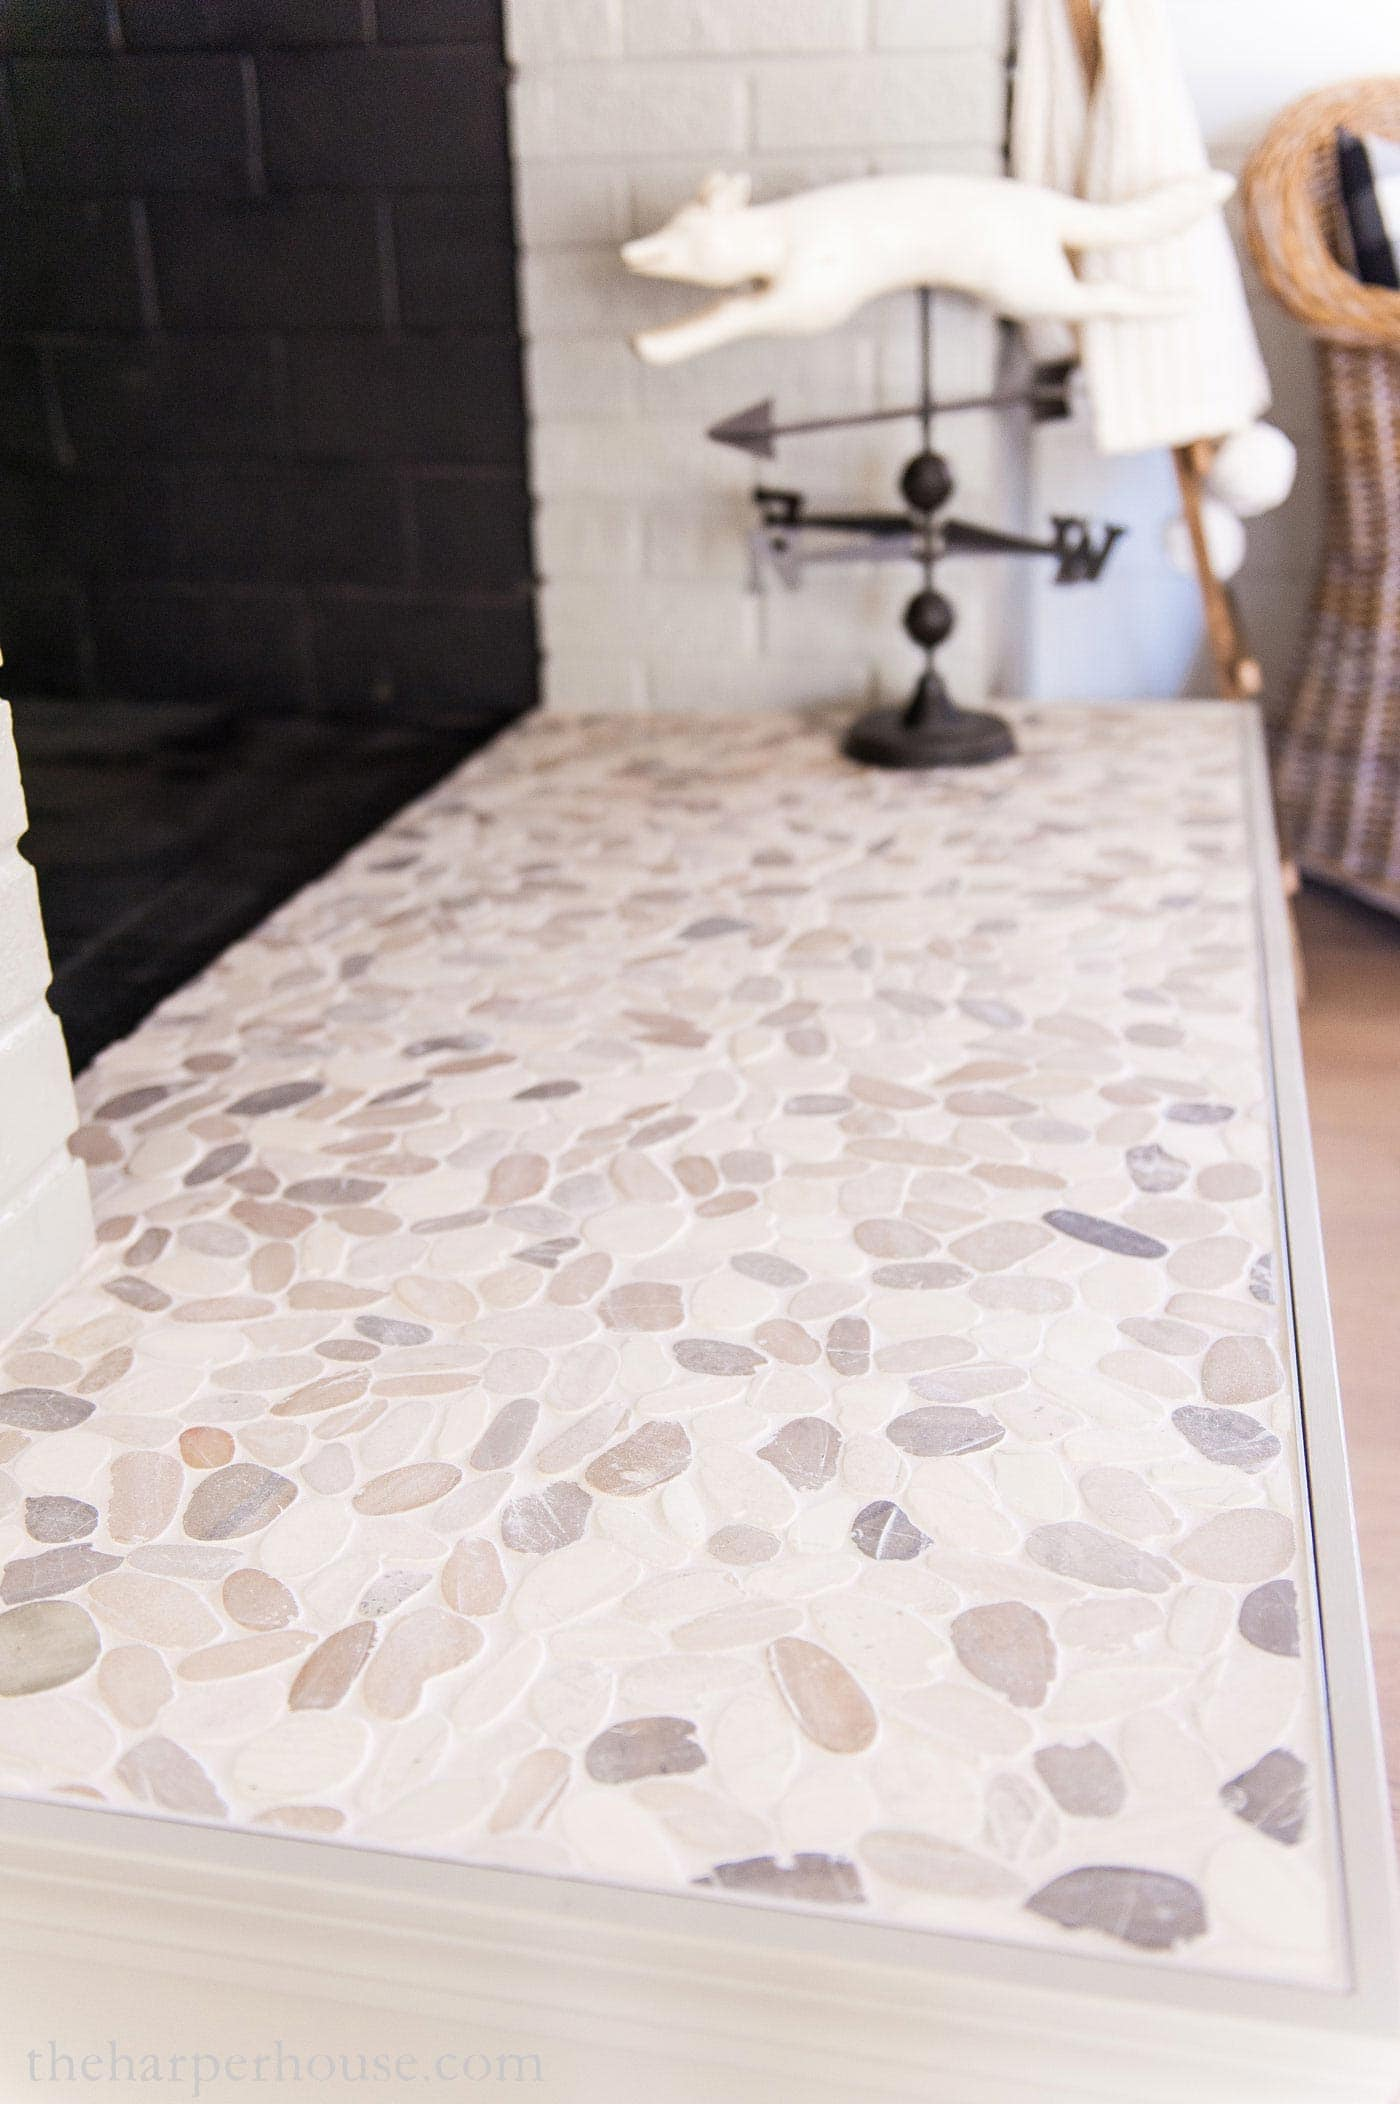 fireplace hearth tile using pebble stone mosaic tile